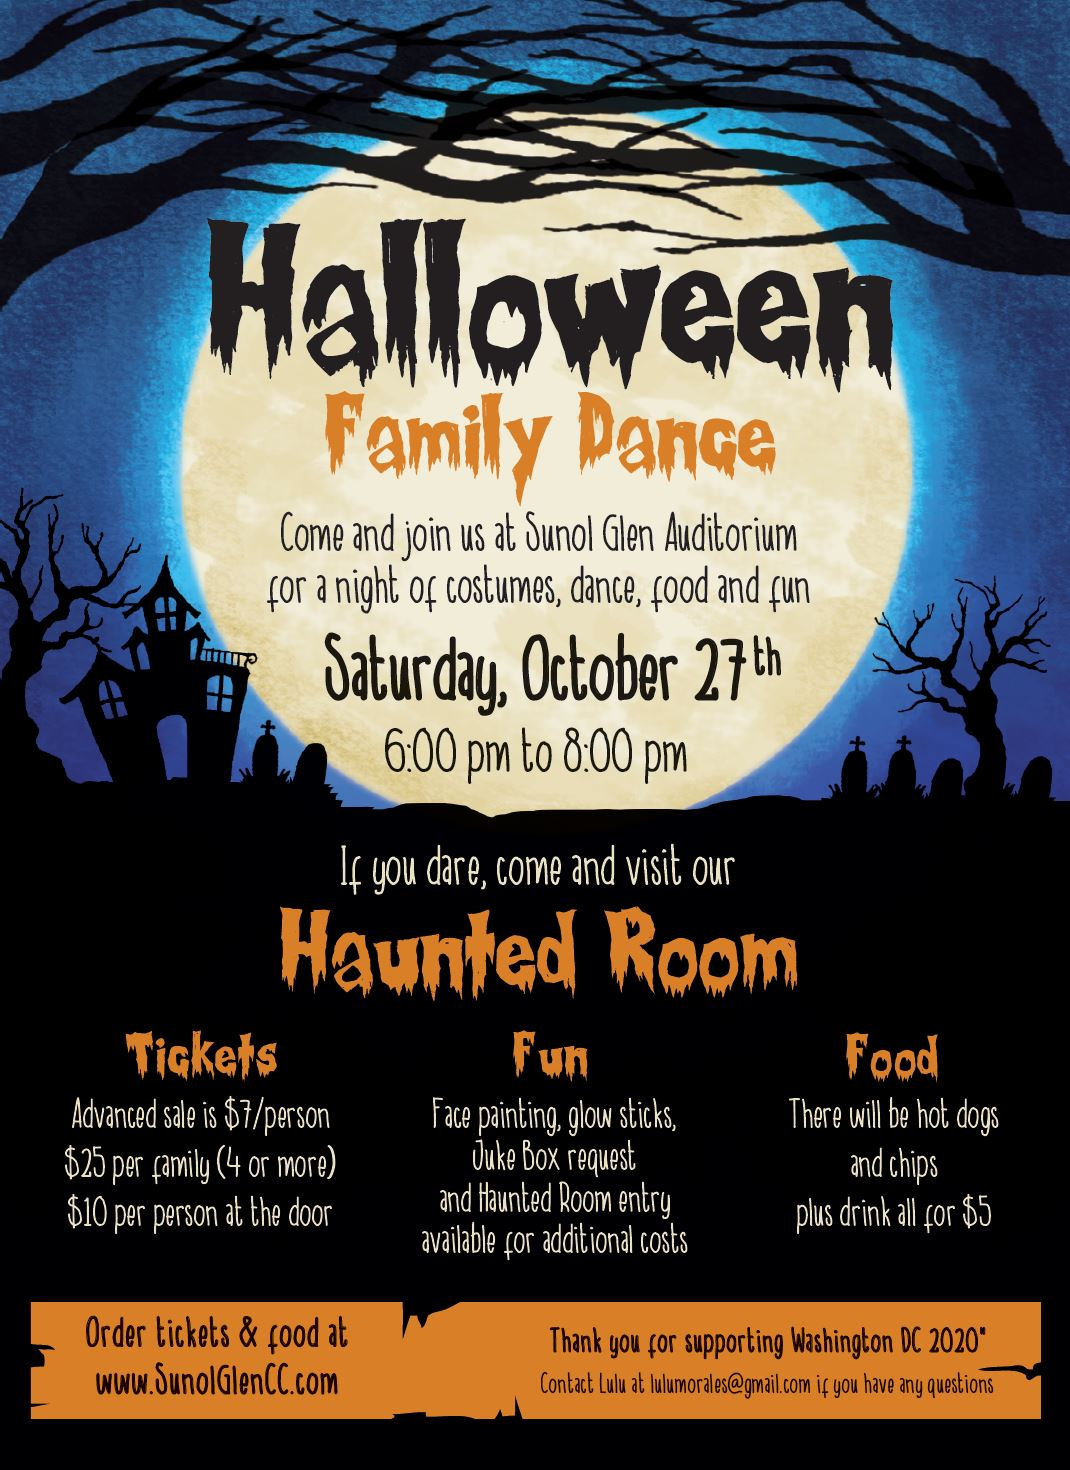 Halloween 2020 Washington Dc Washington DC 2020 Halloween Dance 2018   Sunol Glen School